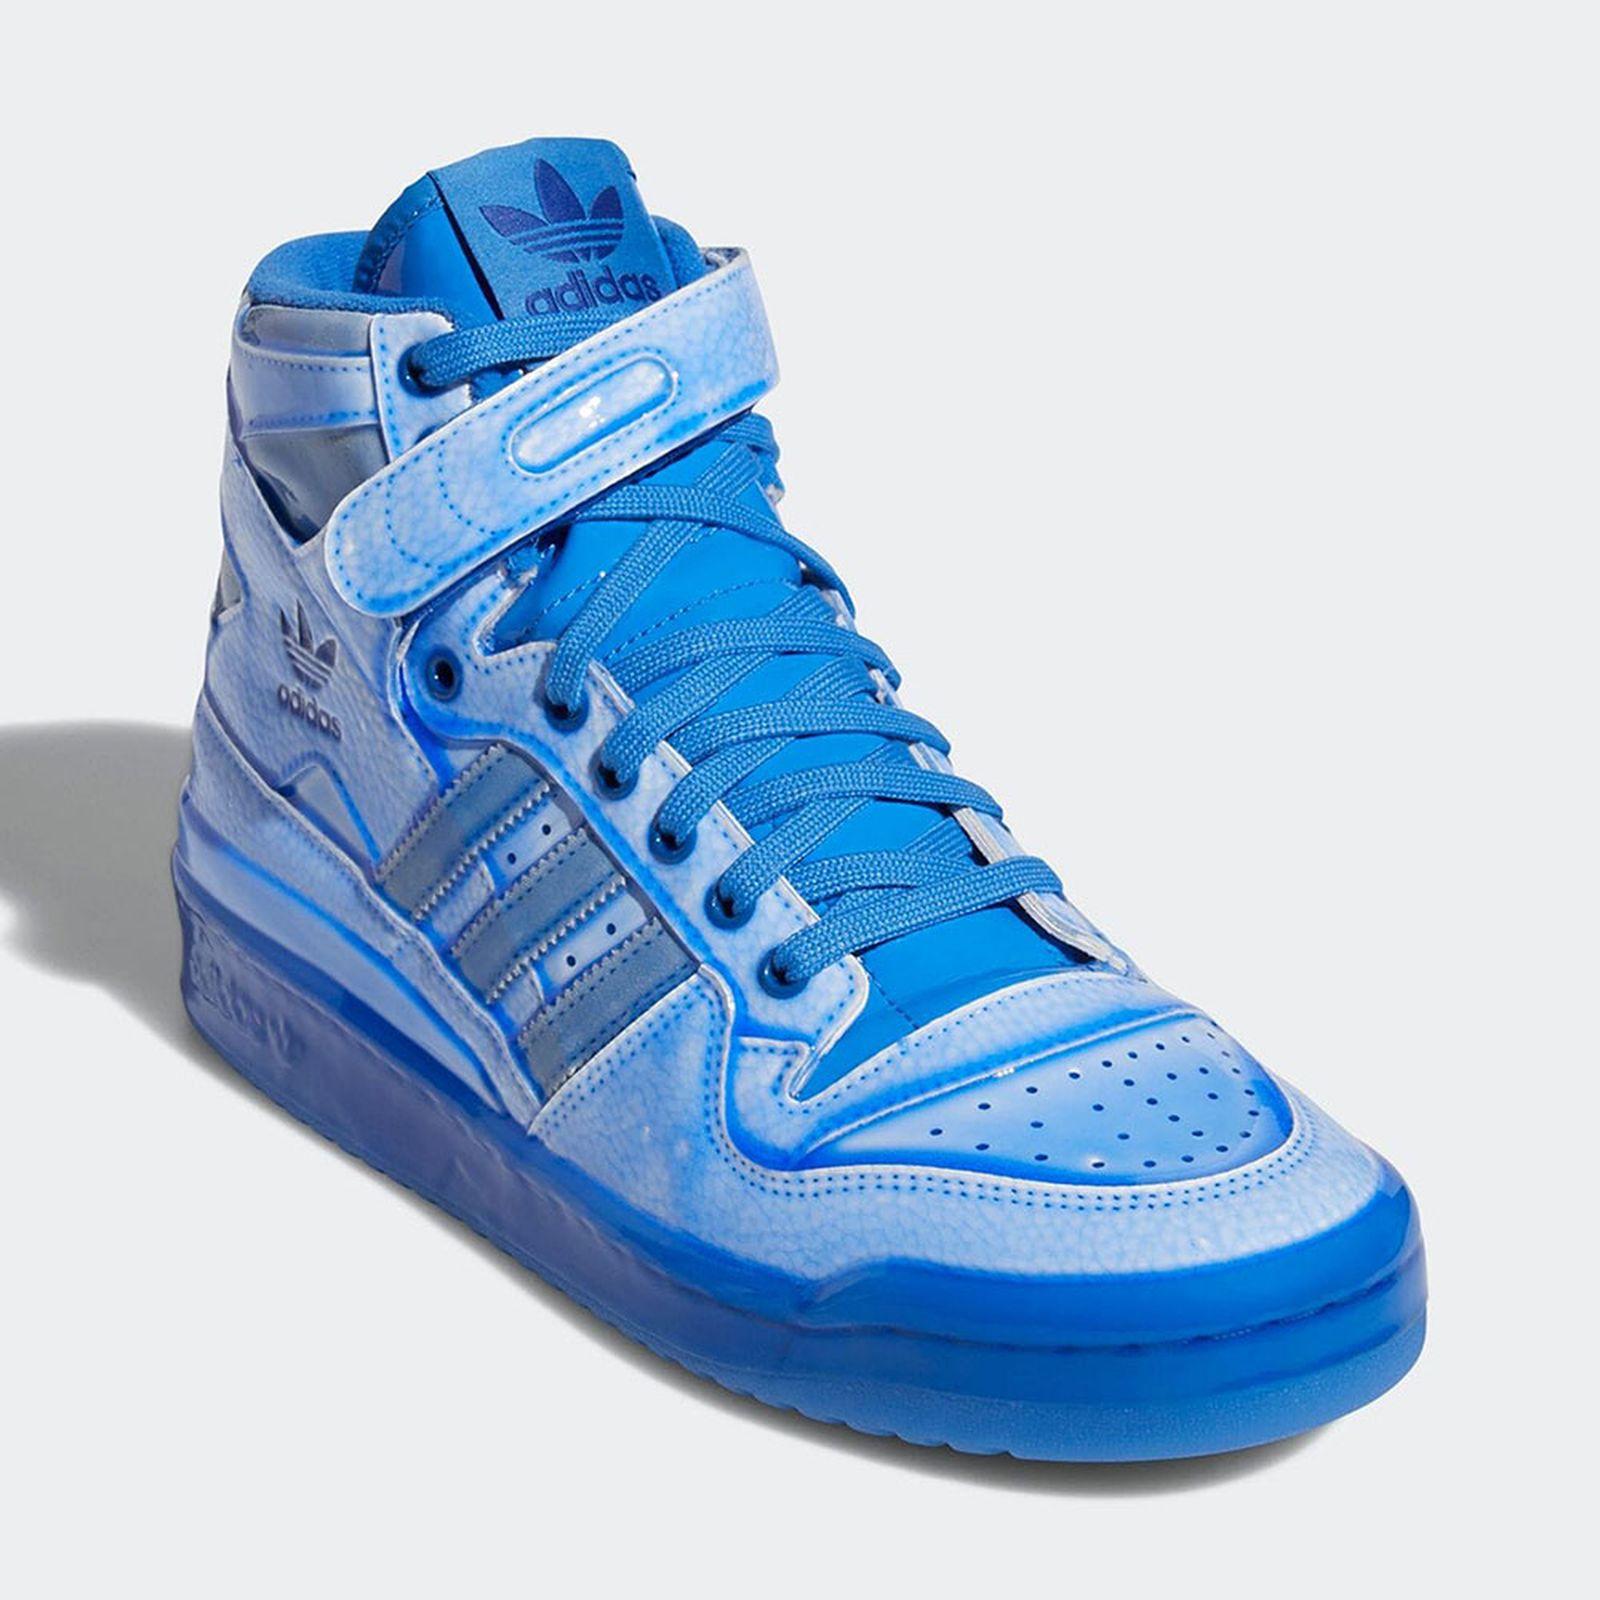 jeremy-scott-adidas-forum-hi-release-date-price-11